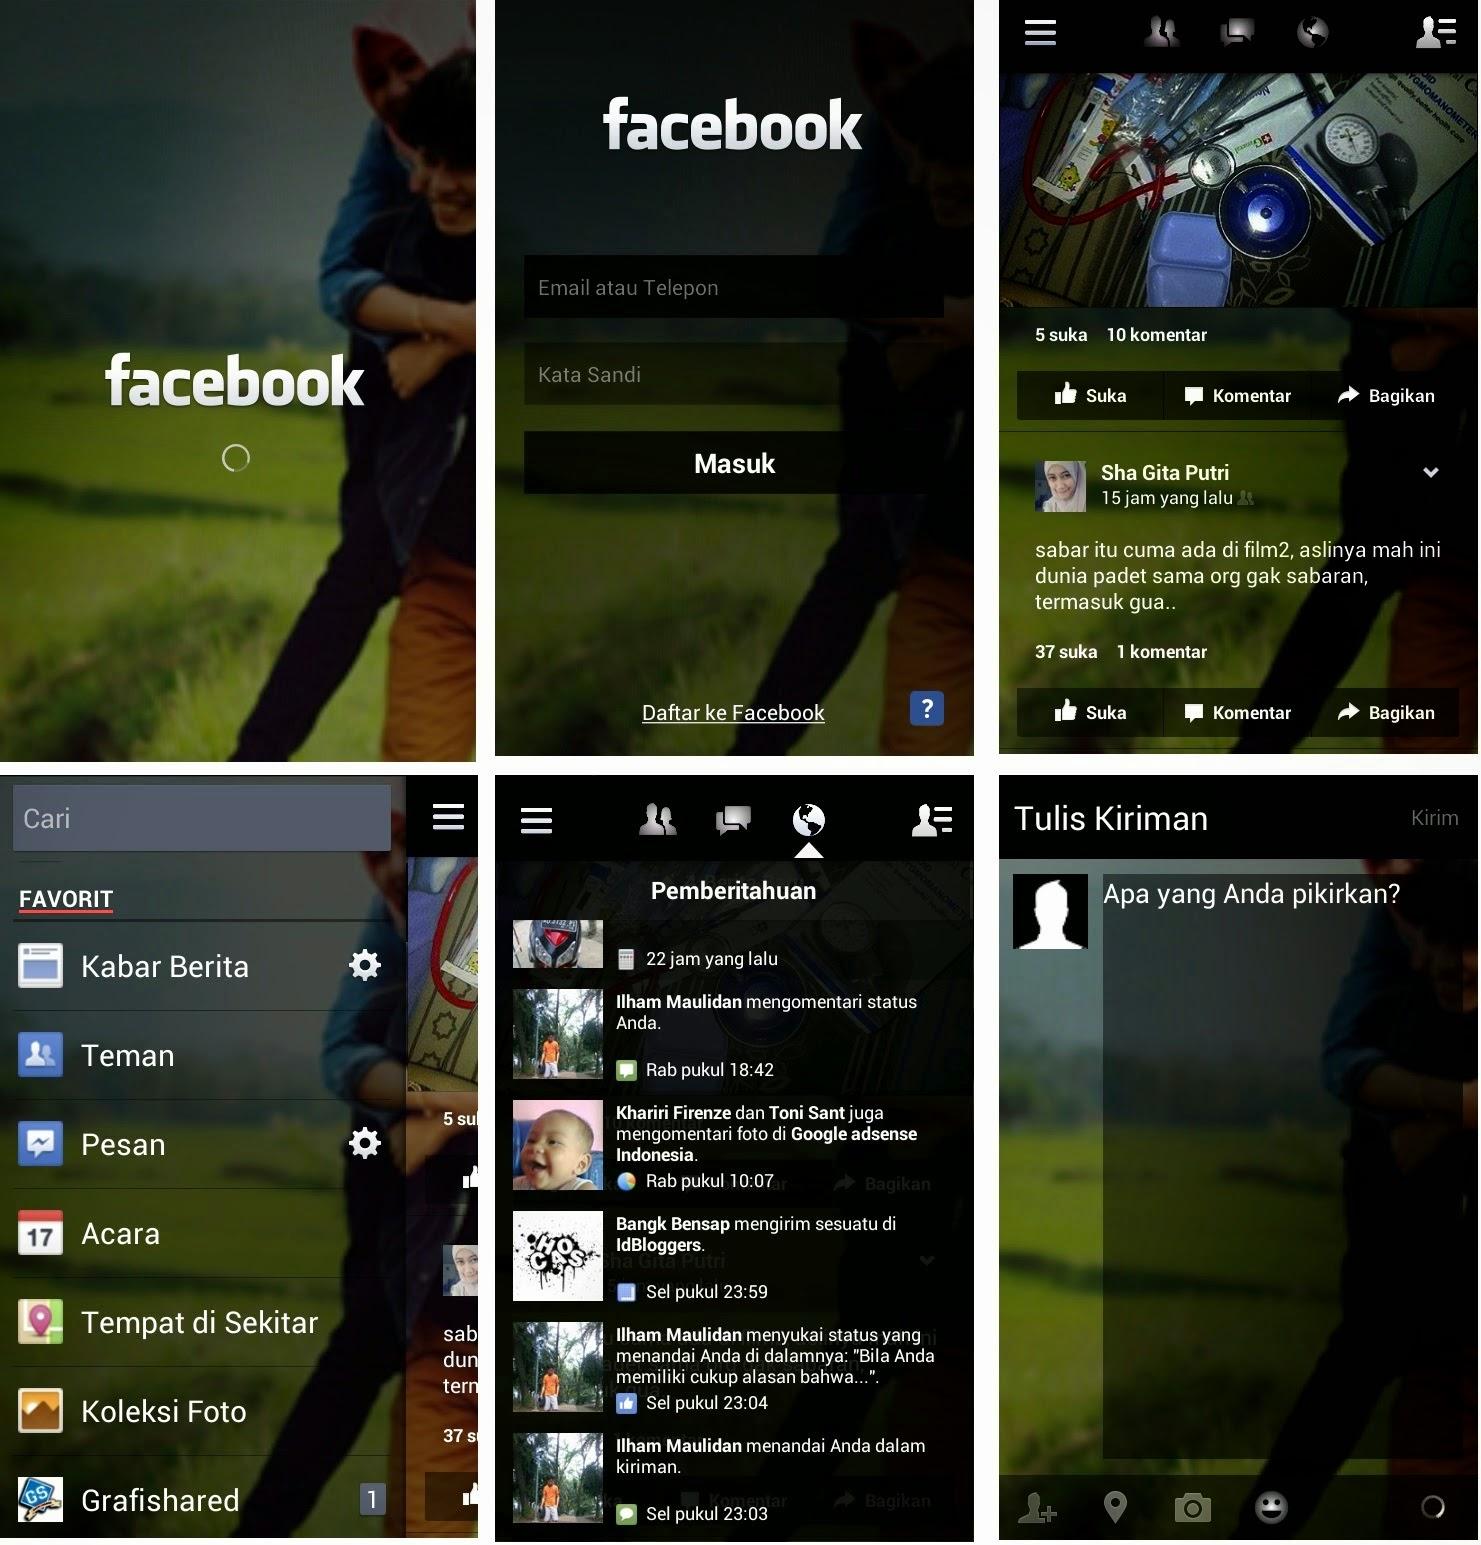 Facebook Mod Terbaru 2015